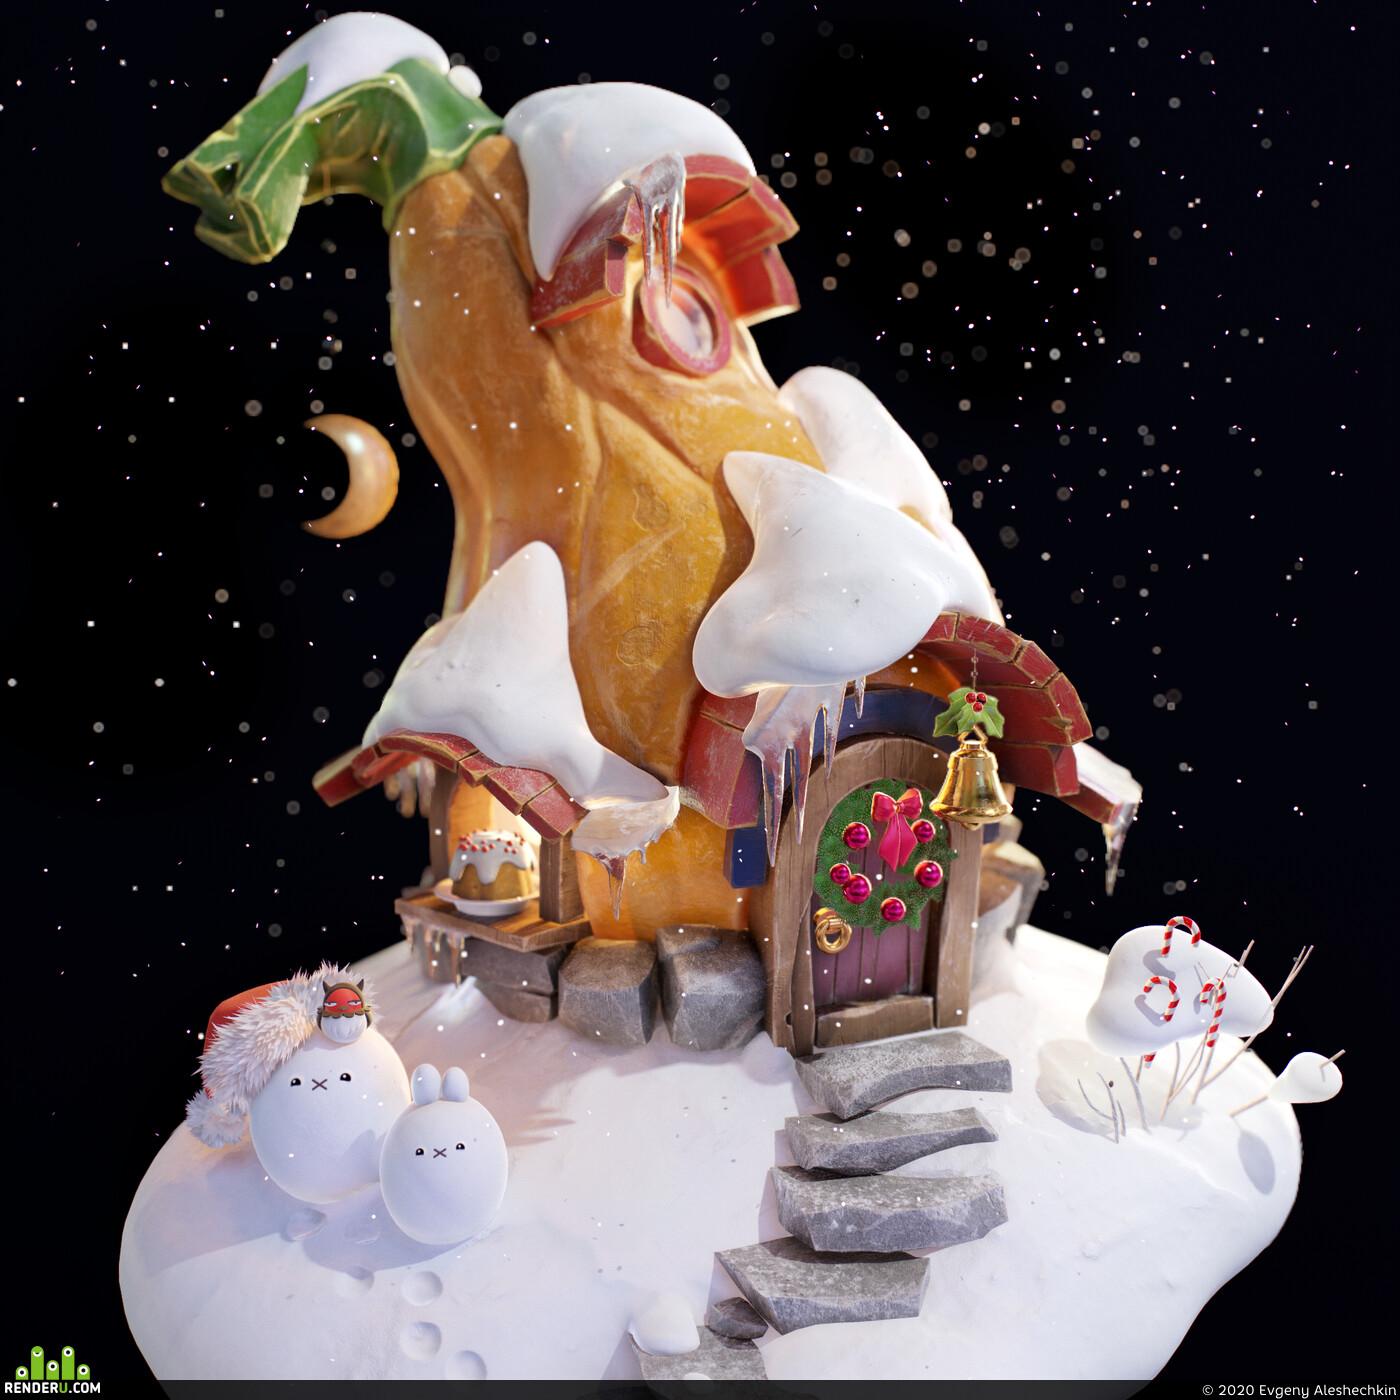 christmas, snow, new year, house